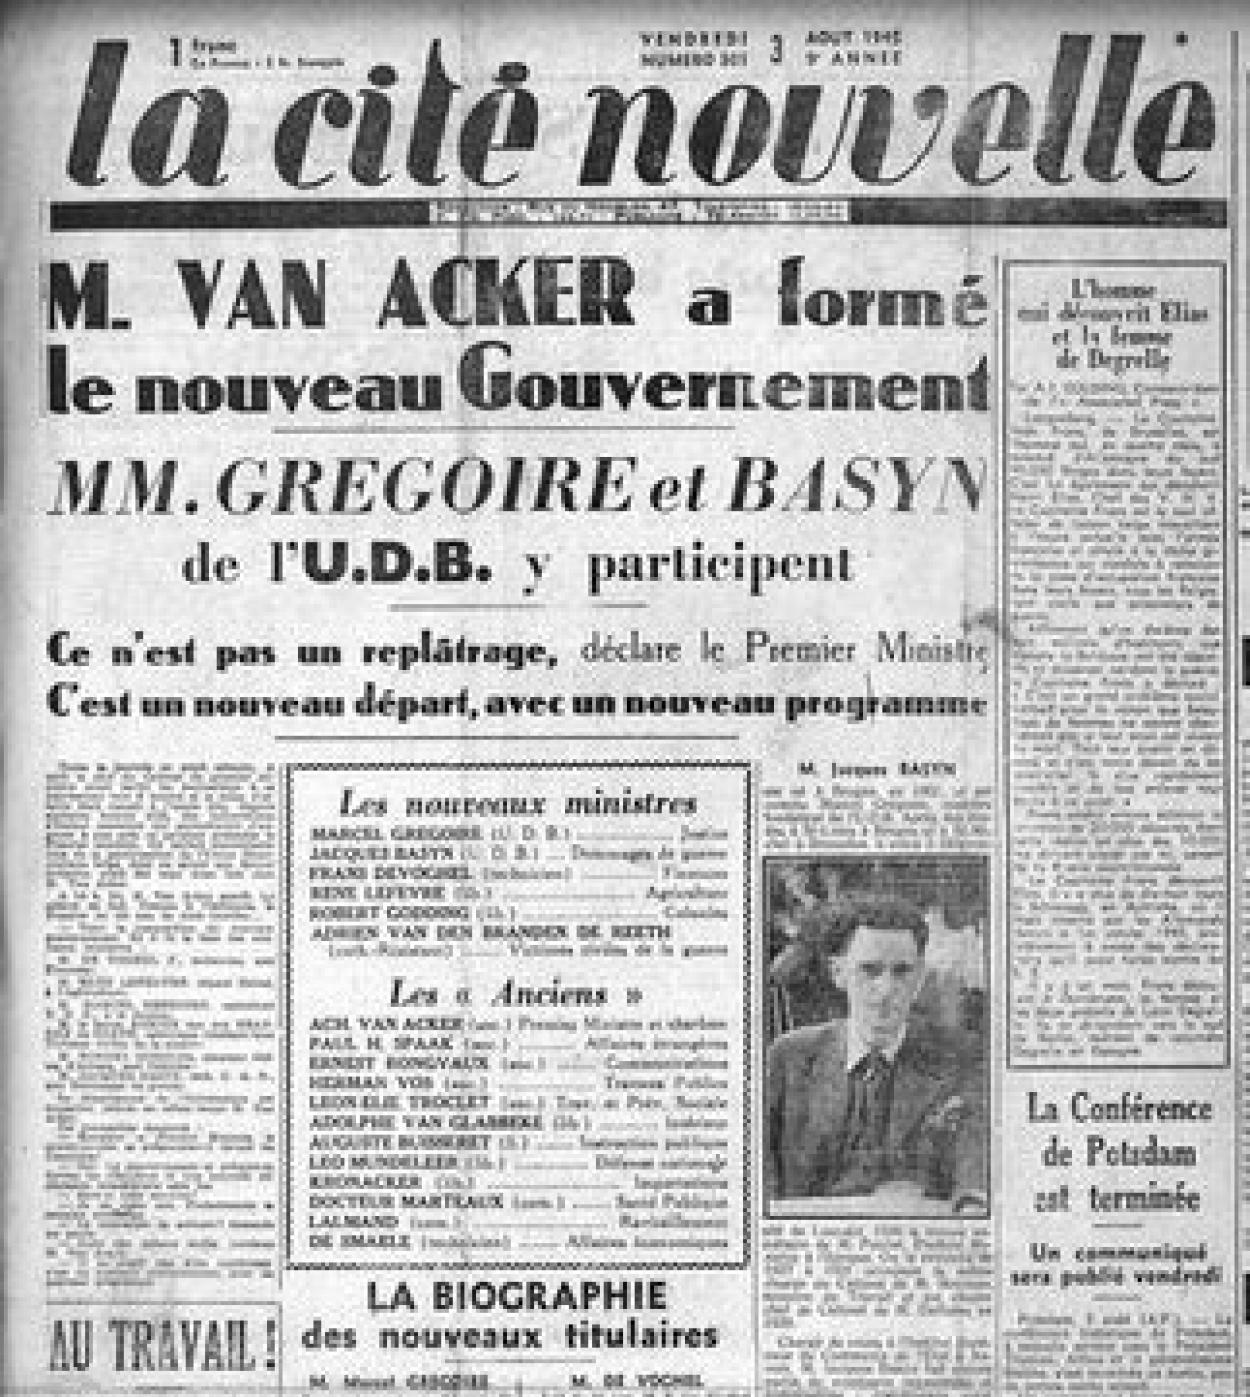 screenshot-2020-08-19-15-19-20-la-citA-nouvelle-3-8-1945.jpg